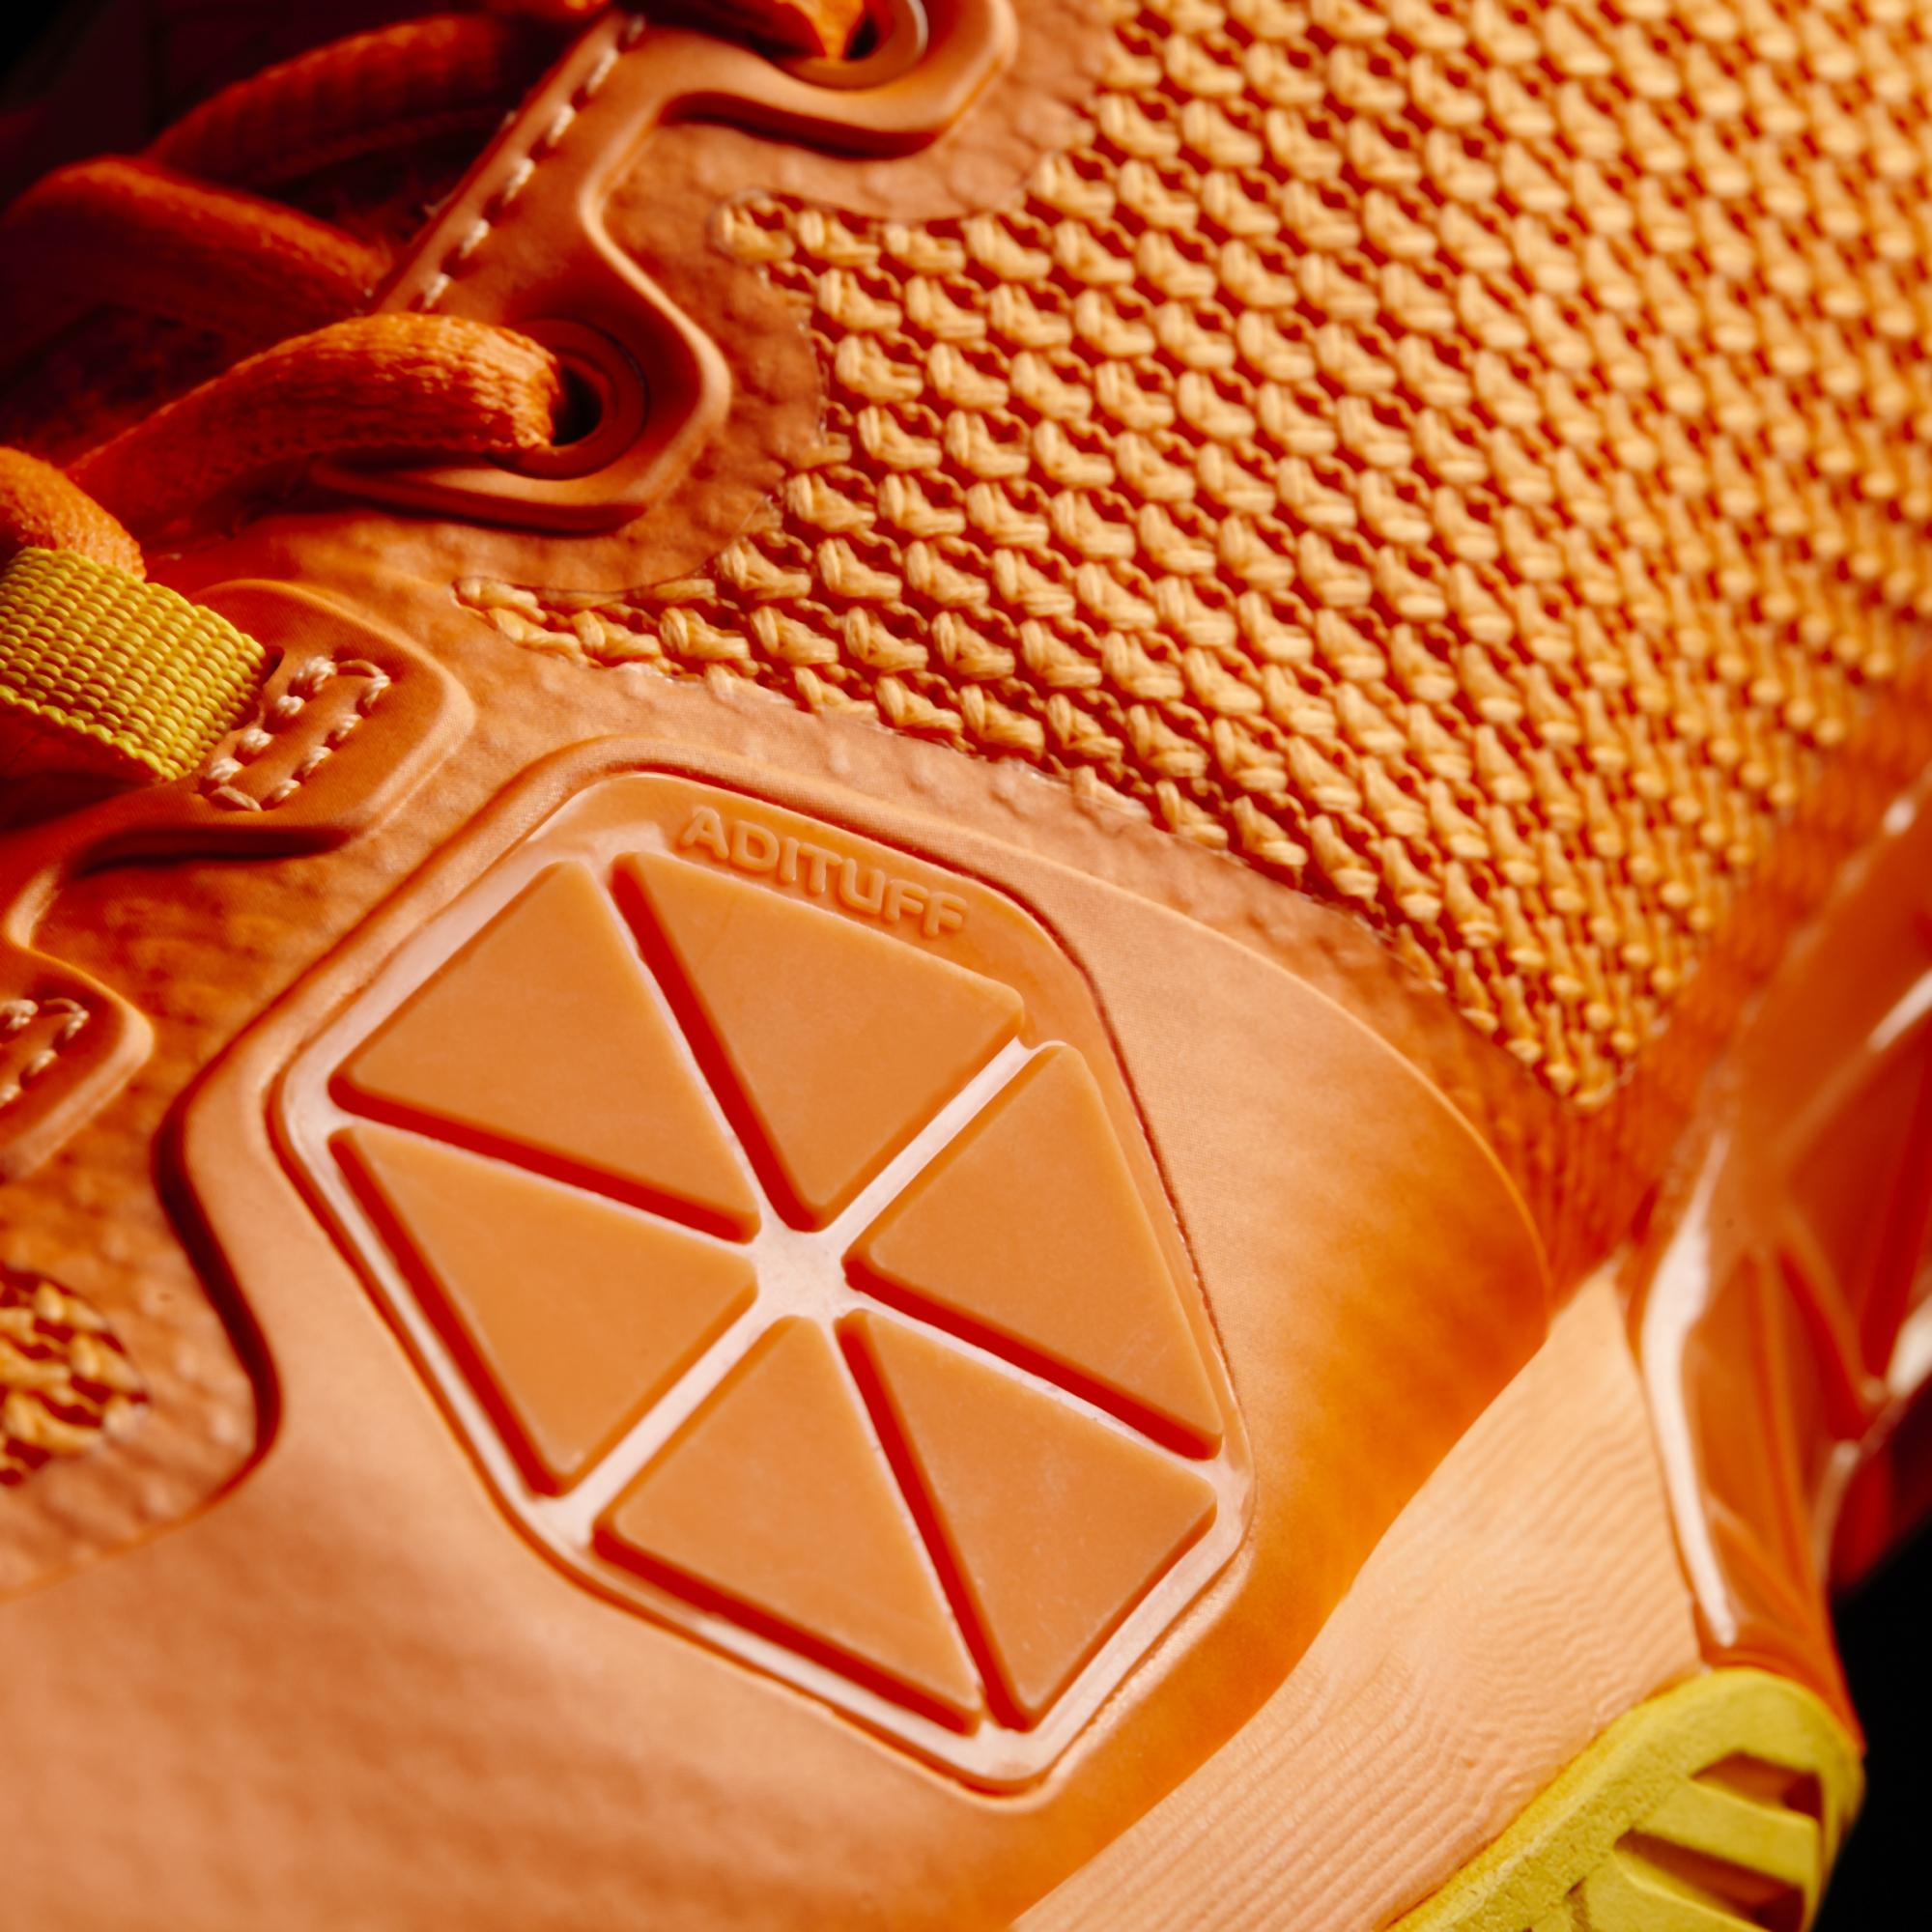 Adidas Uomo barricata luce impulso scarpe da tennis luce barricata arancione / bianco 3932f8